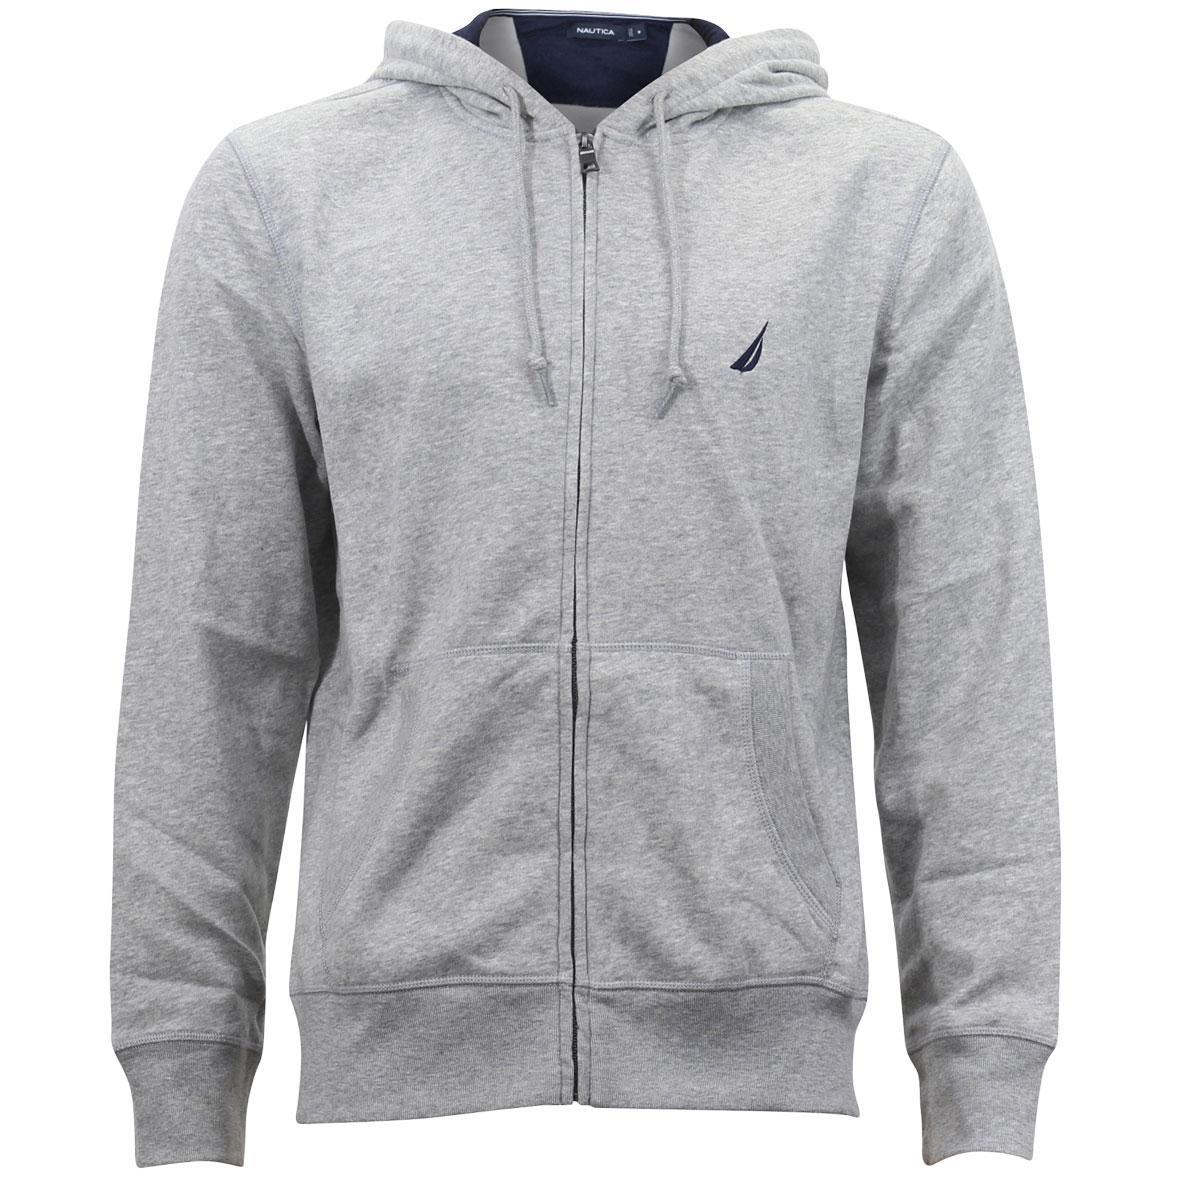 Nautica Men's Full Zip Long Sleeve Hoodie Sweatshirt